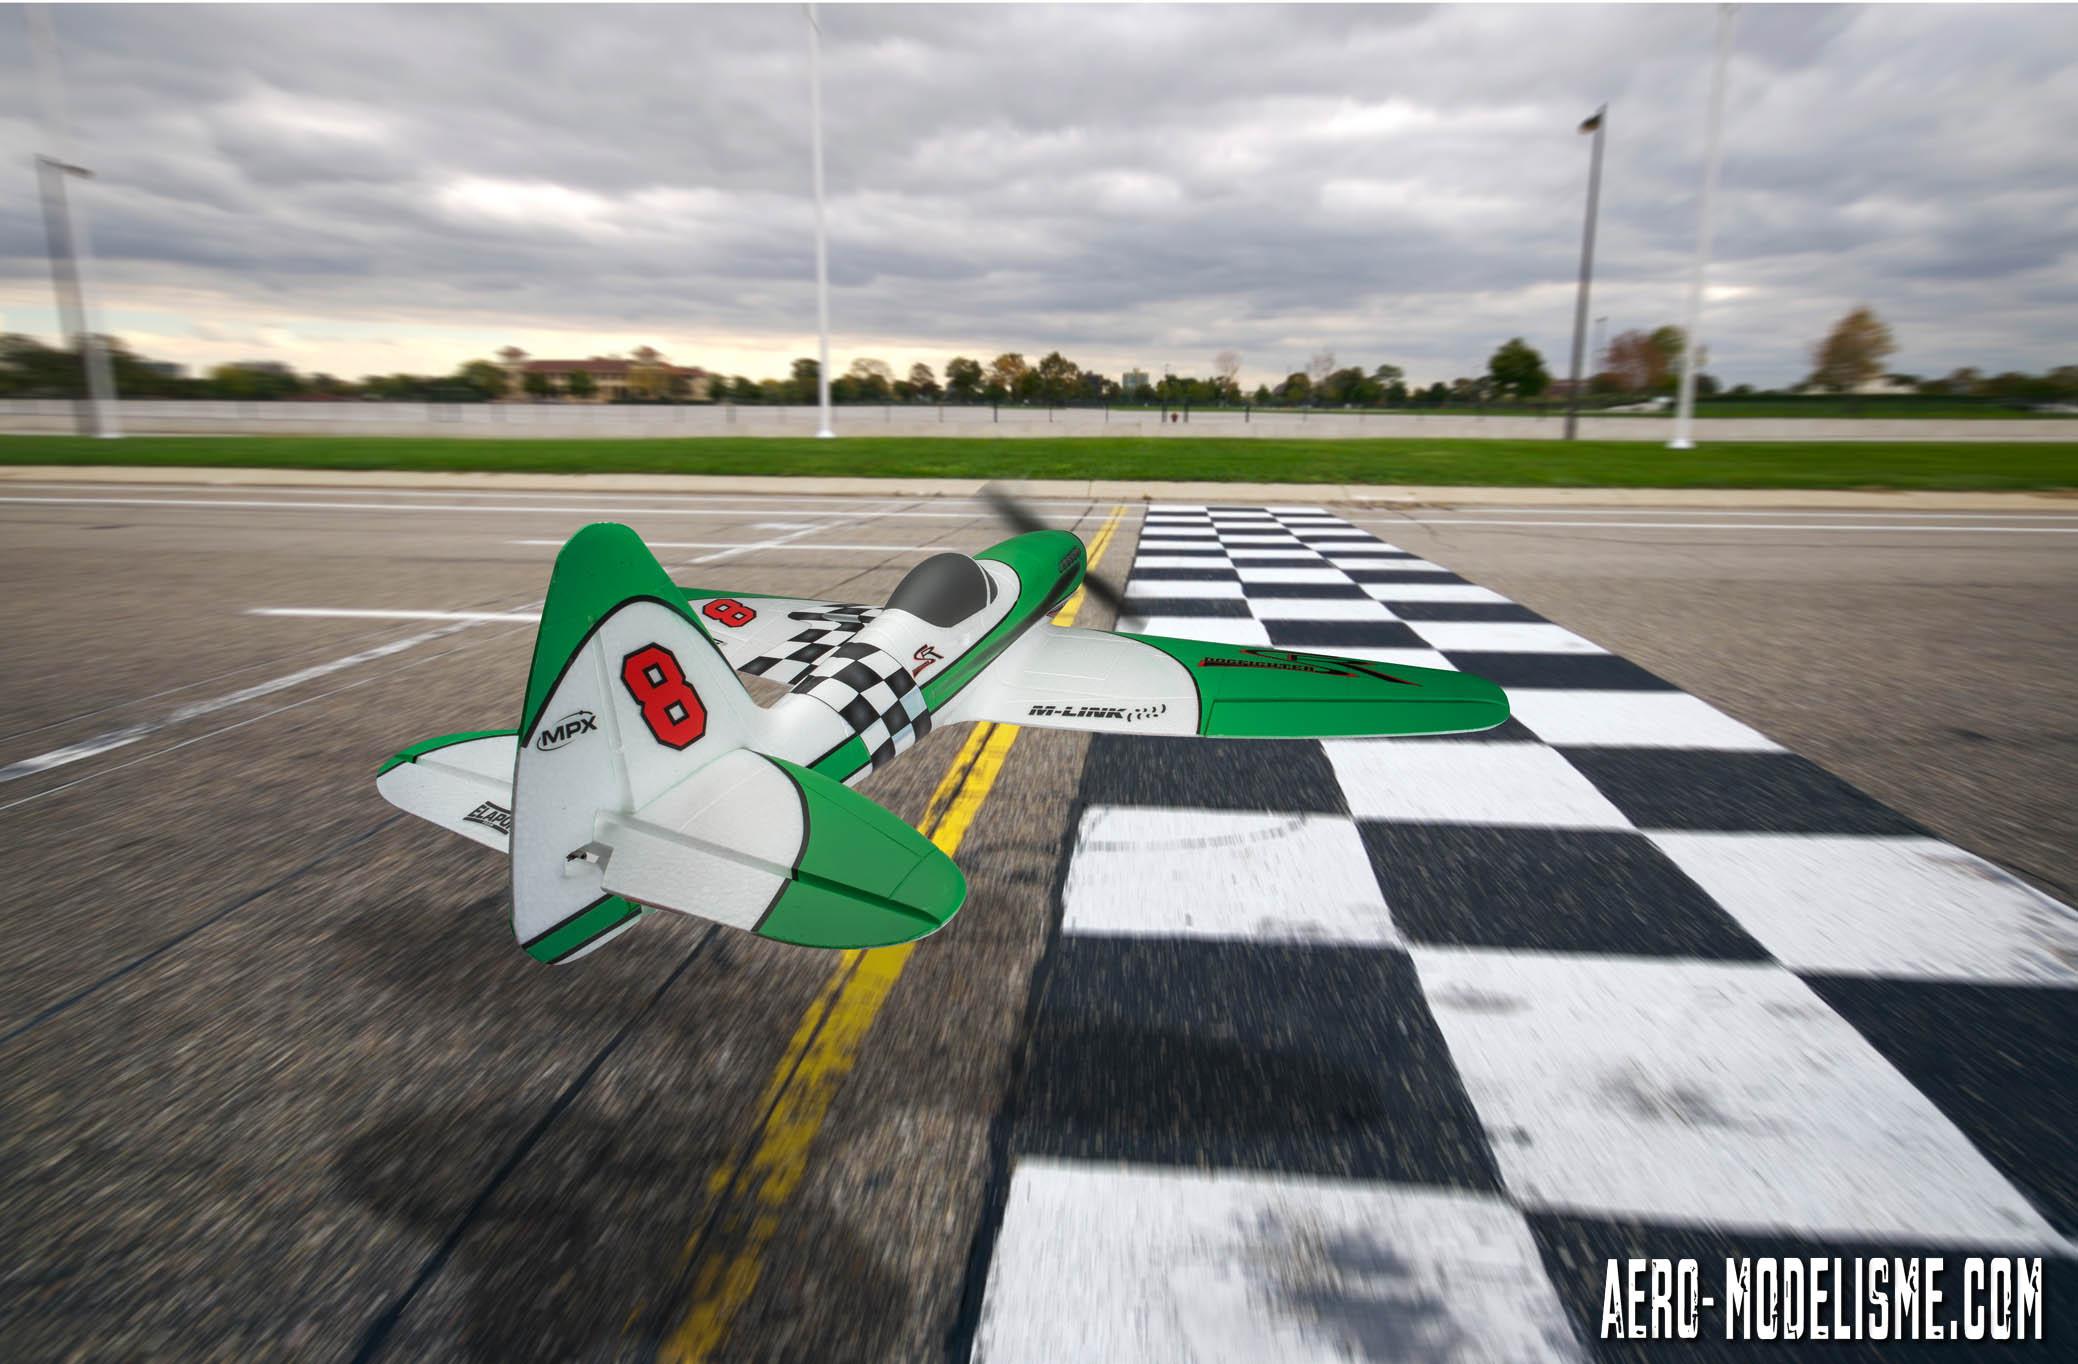 Un fond d'écran du Dogfighter de Multiplex en mode racer